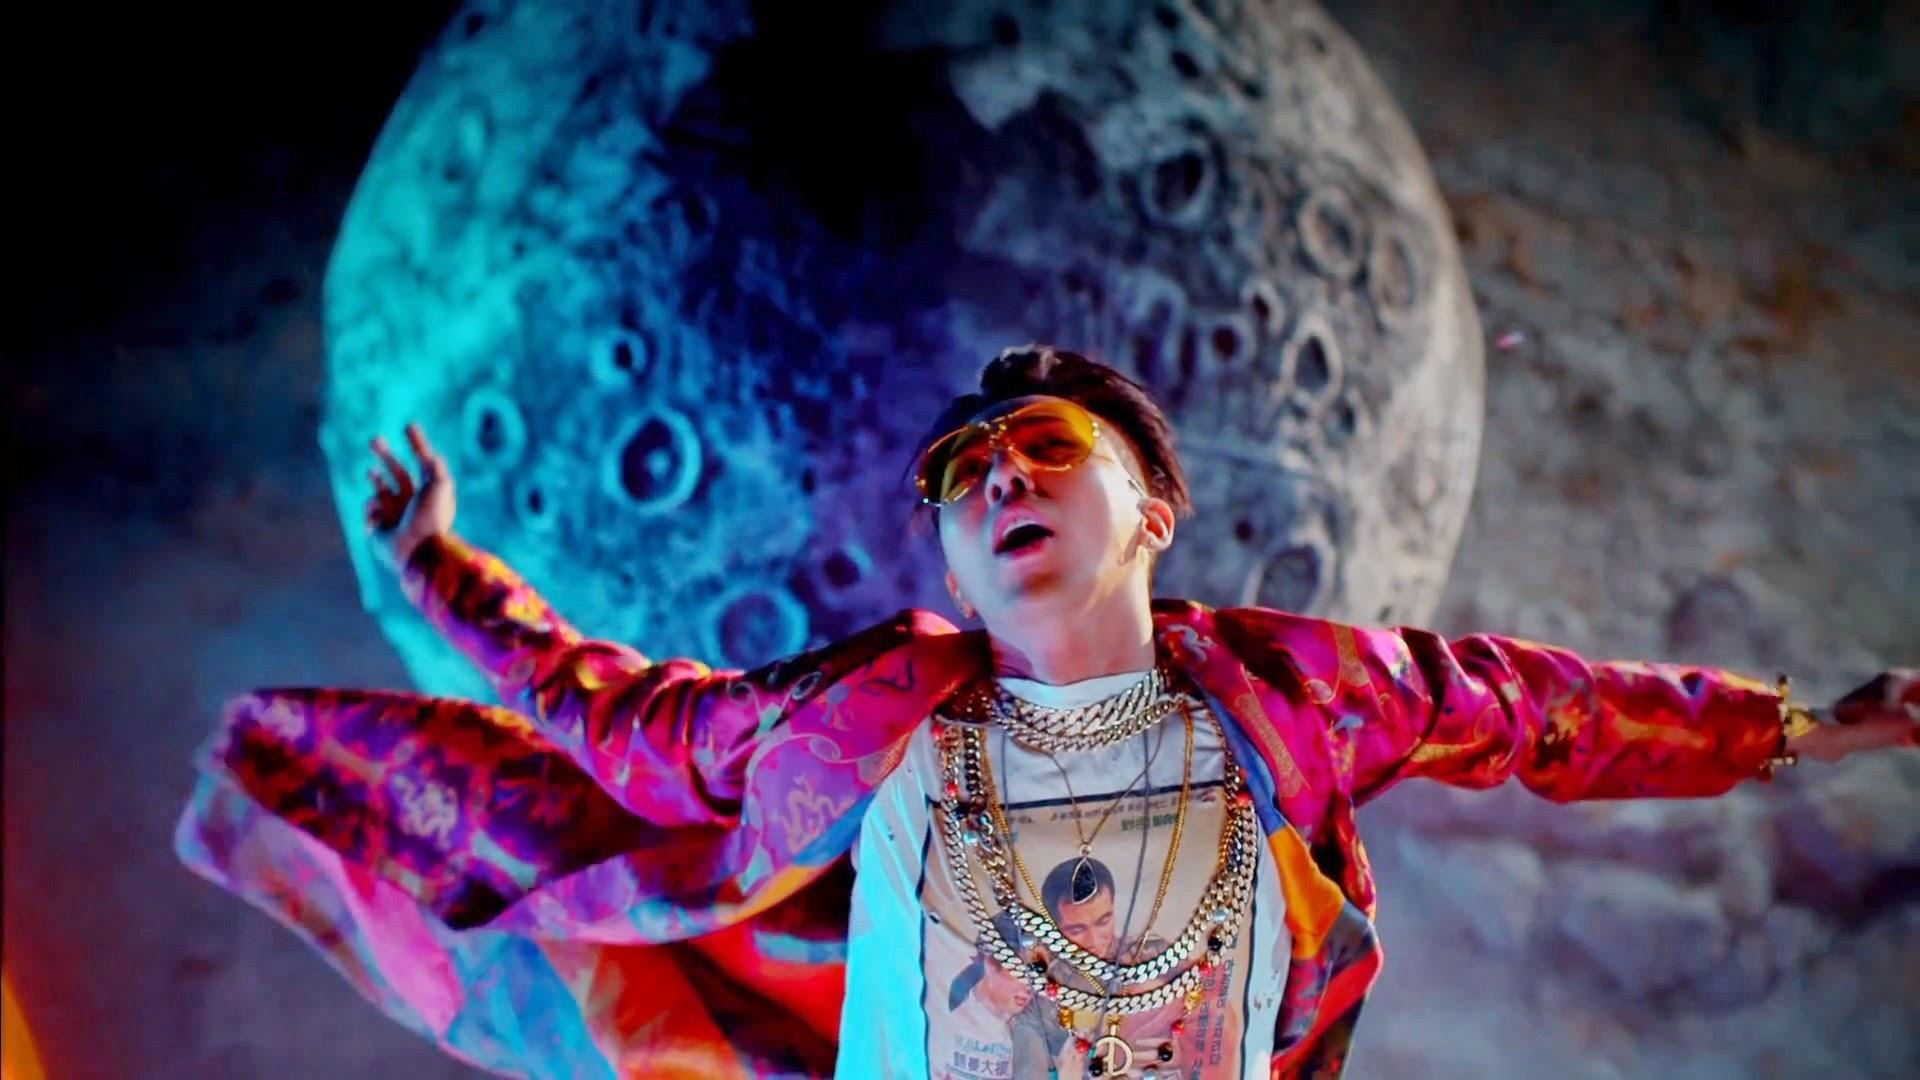 Big Bang's G-Dragon in Bae Bae MV